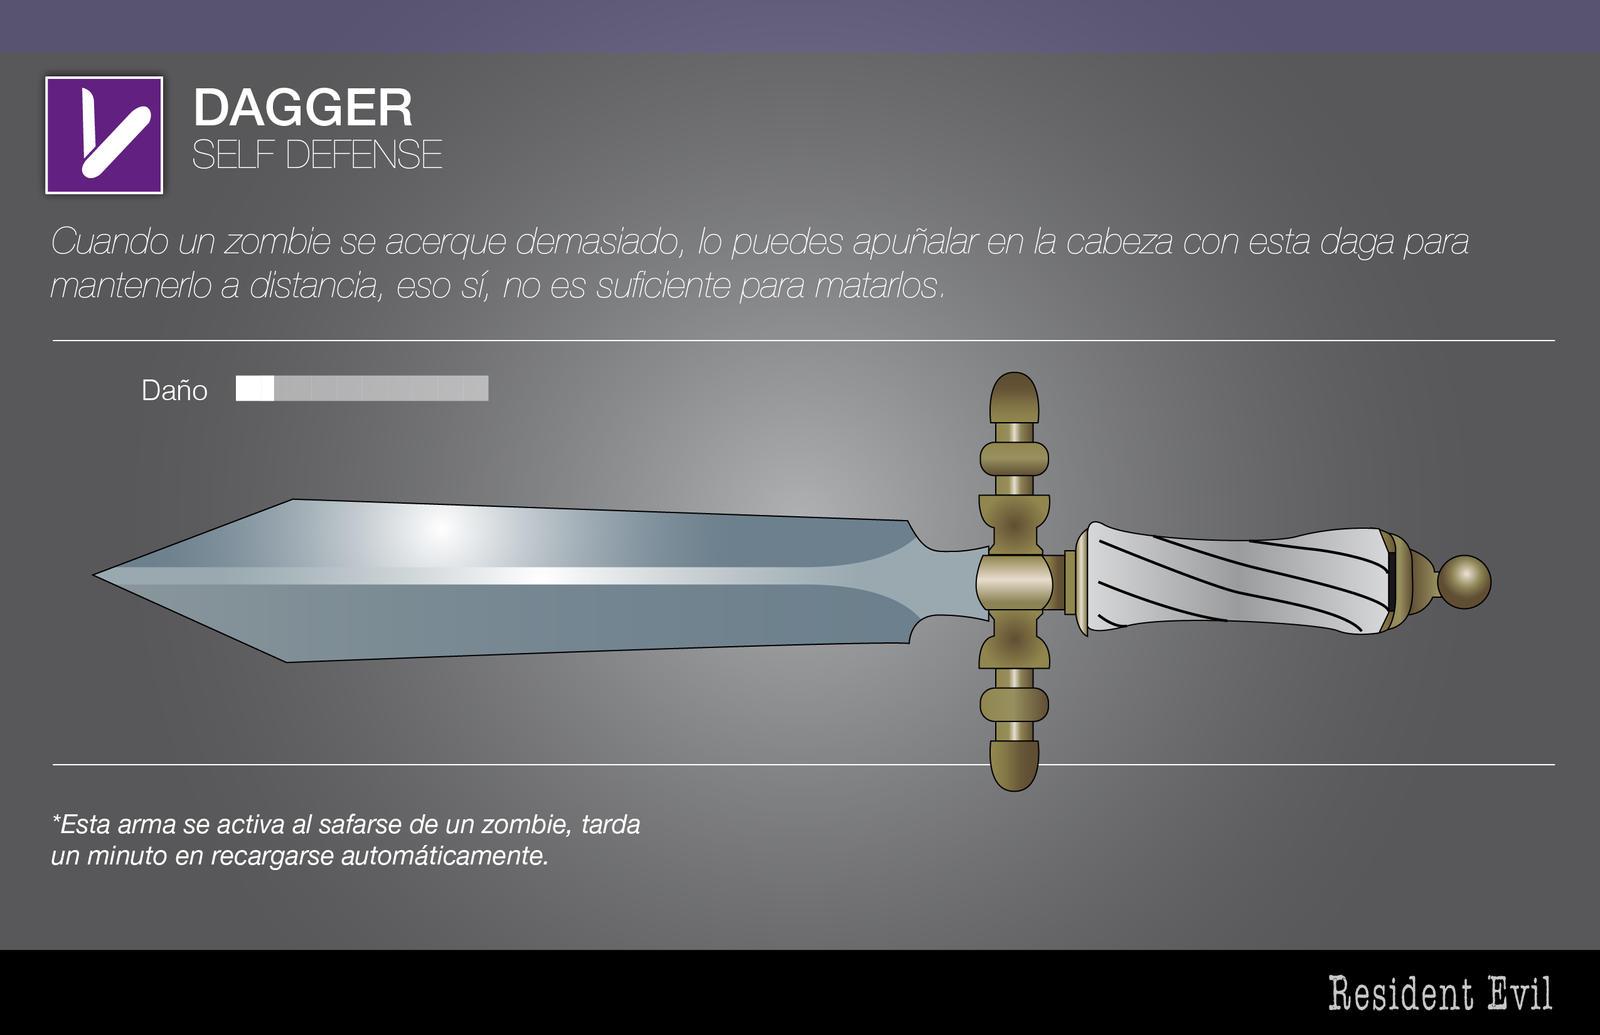 Dagger by efrajoey1